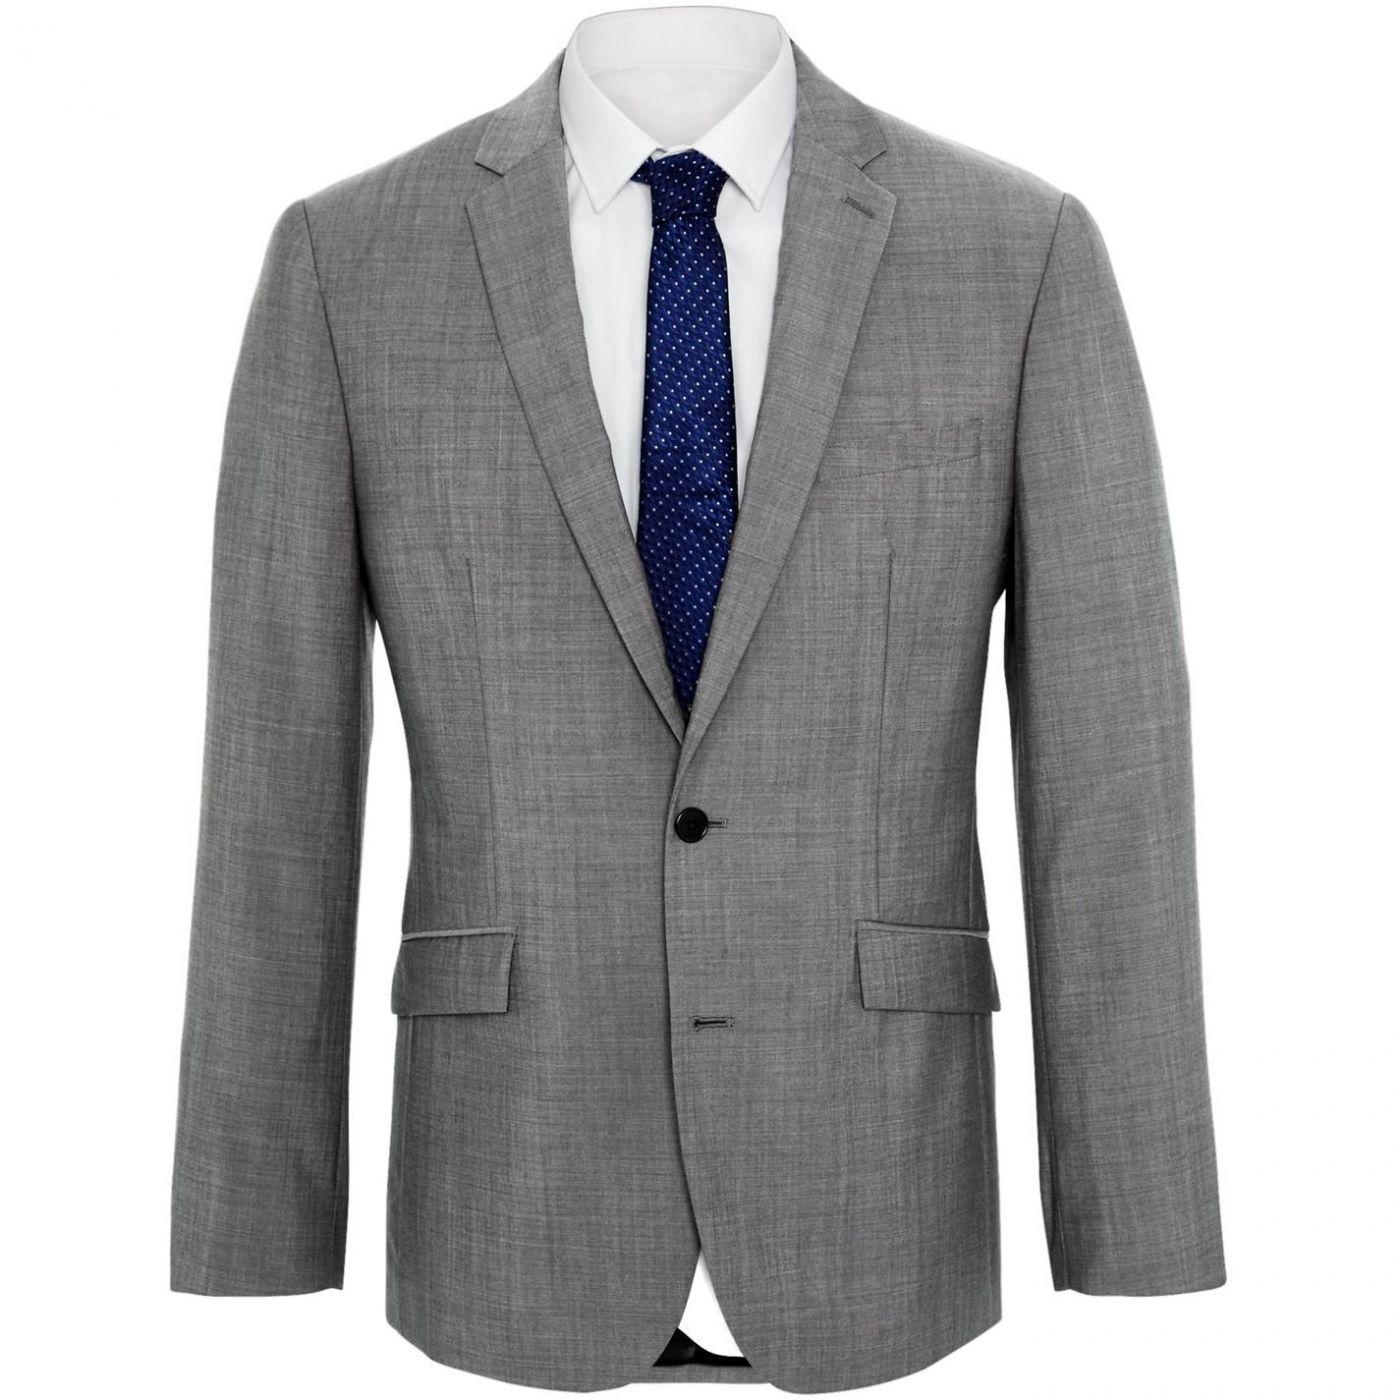 Kenneth Cole Kennedy grey mohair jacket